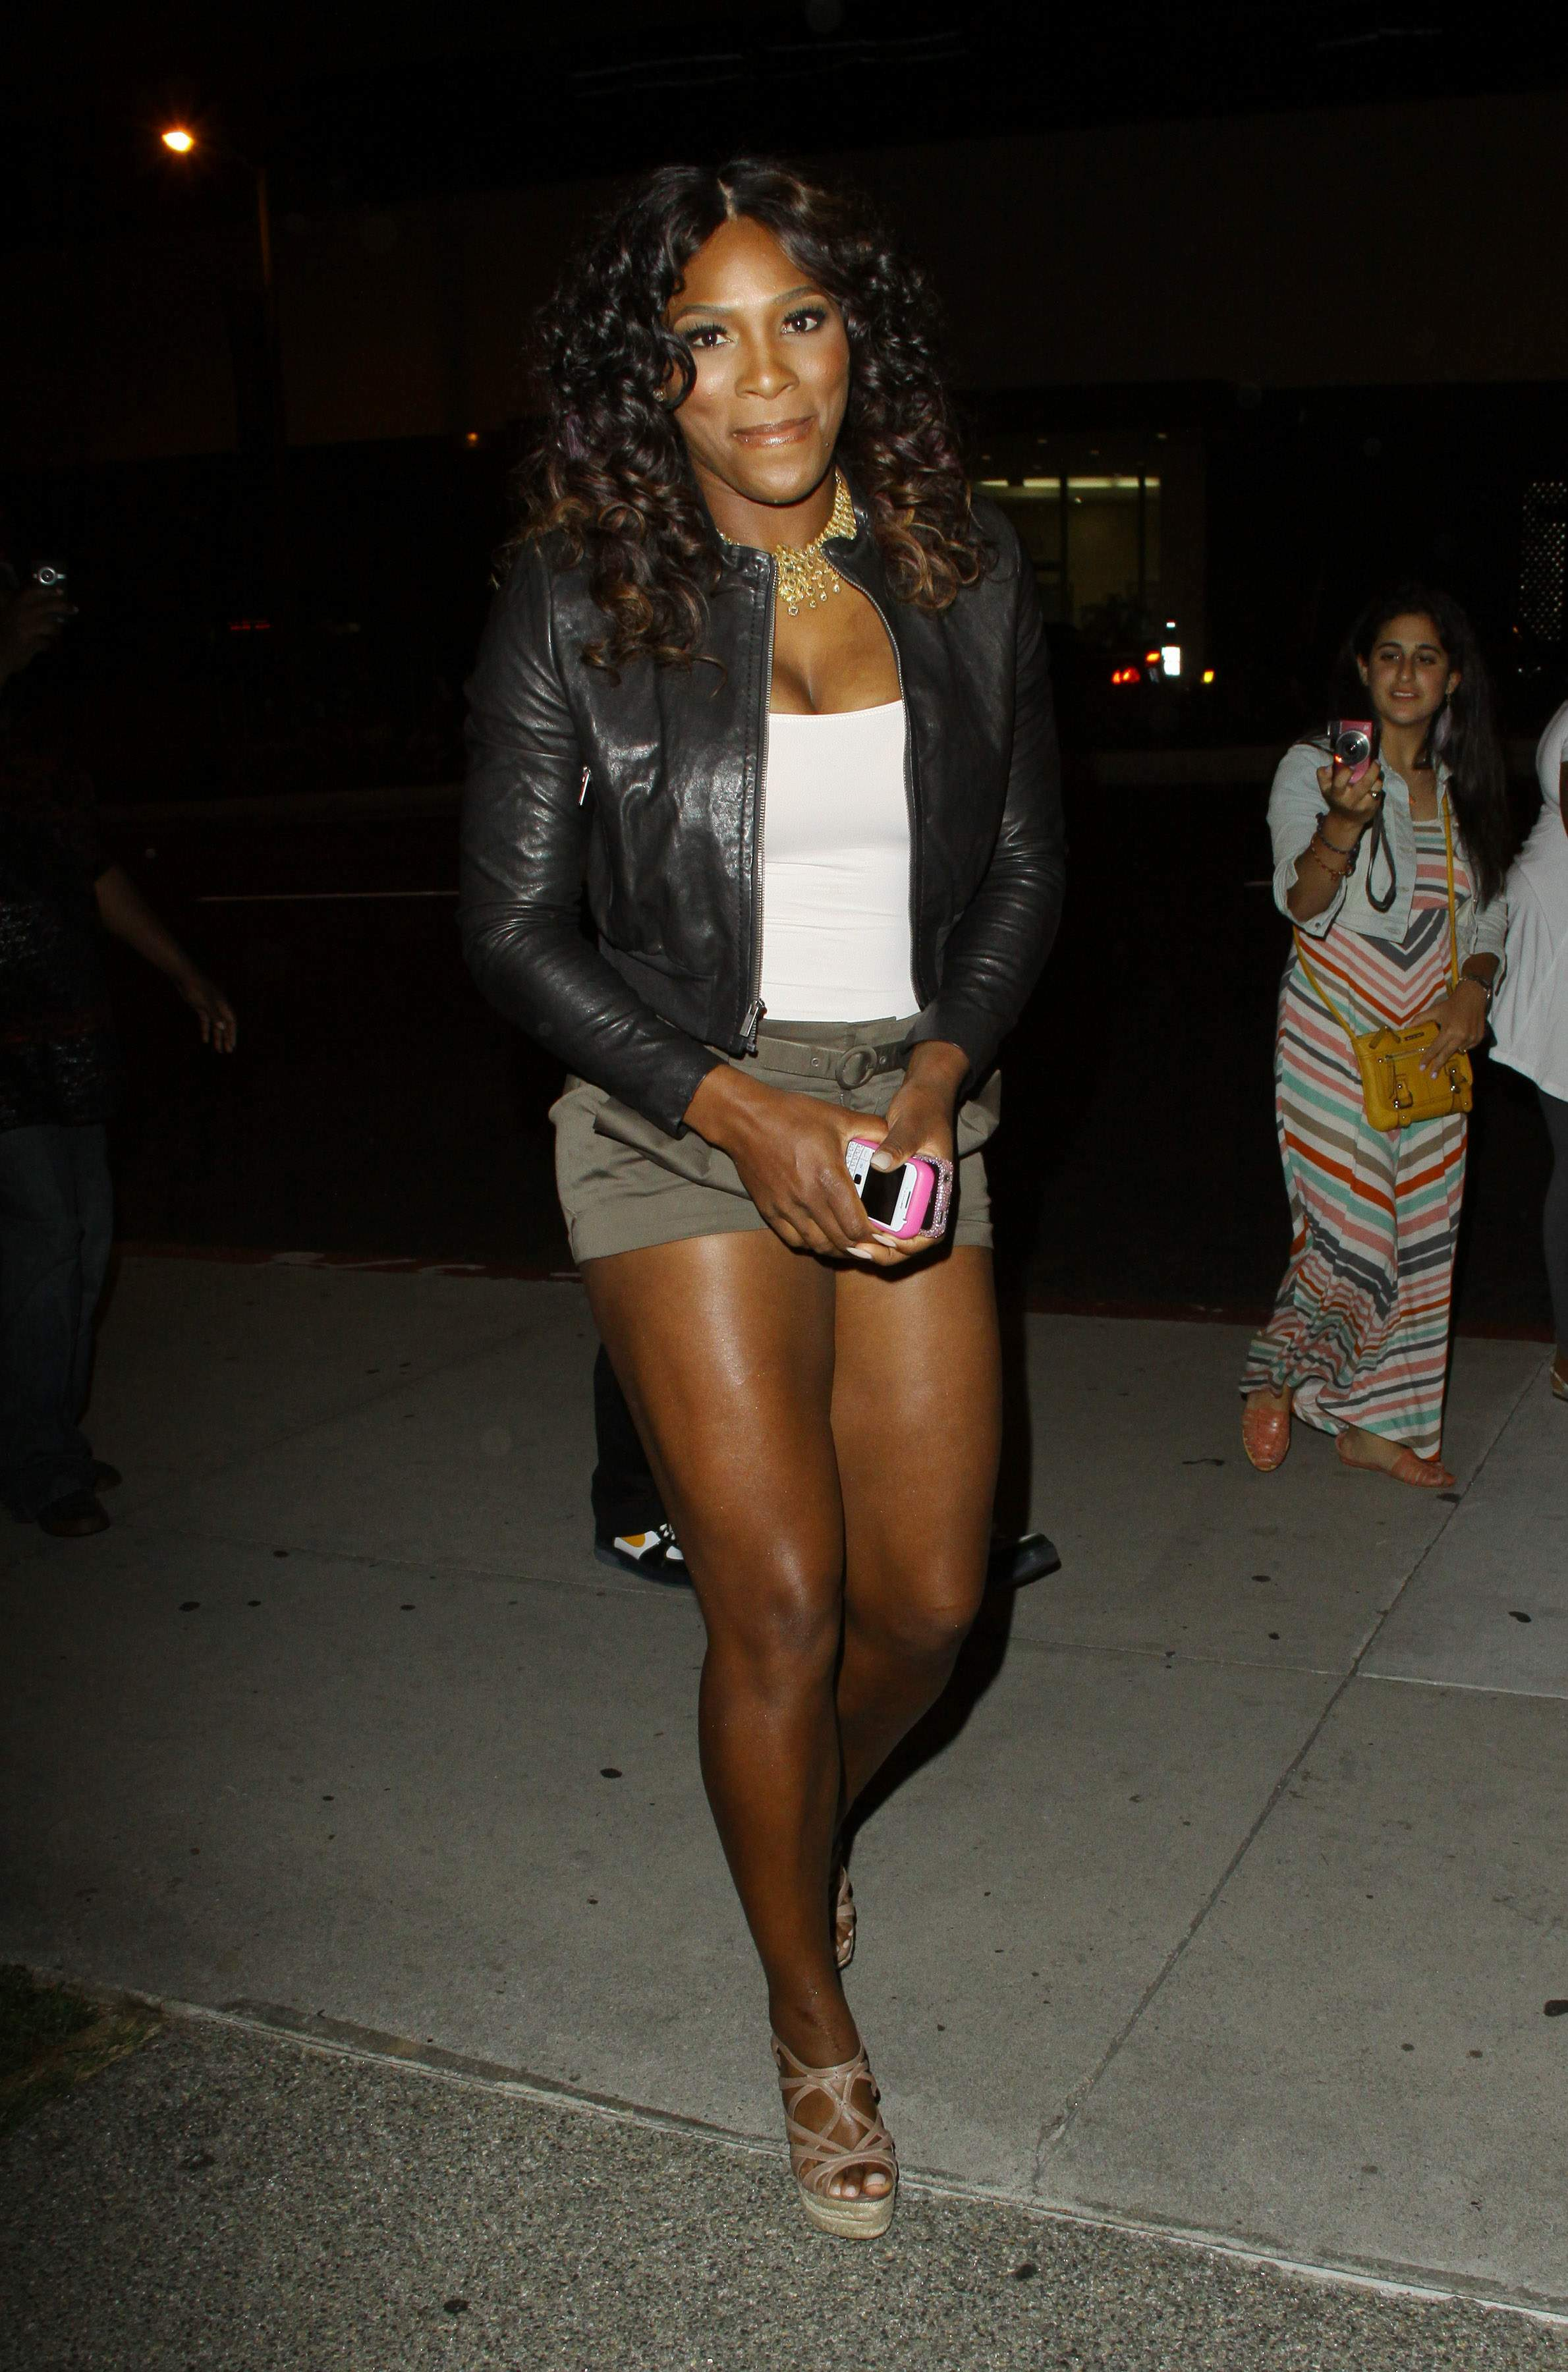 Serena Williams BoaSteakhouseJuly13201115_123_102lo.JPG